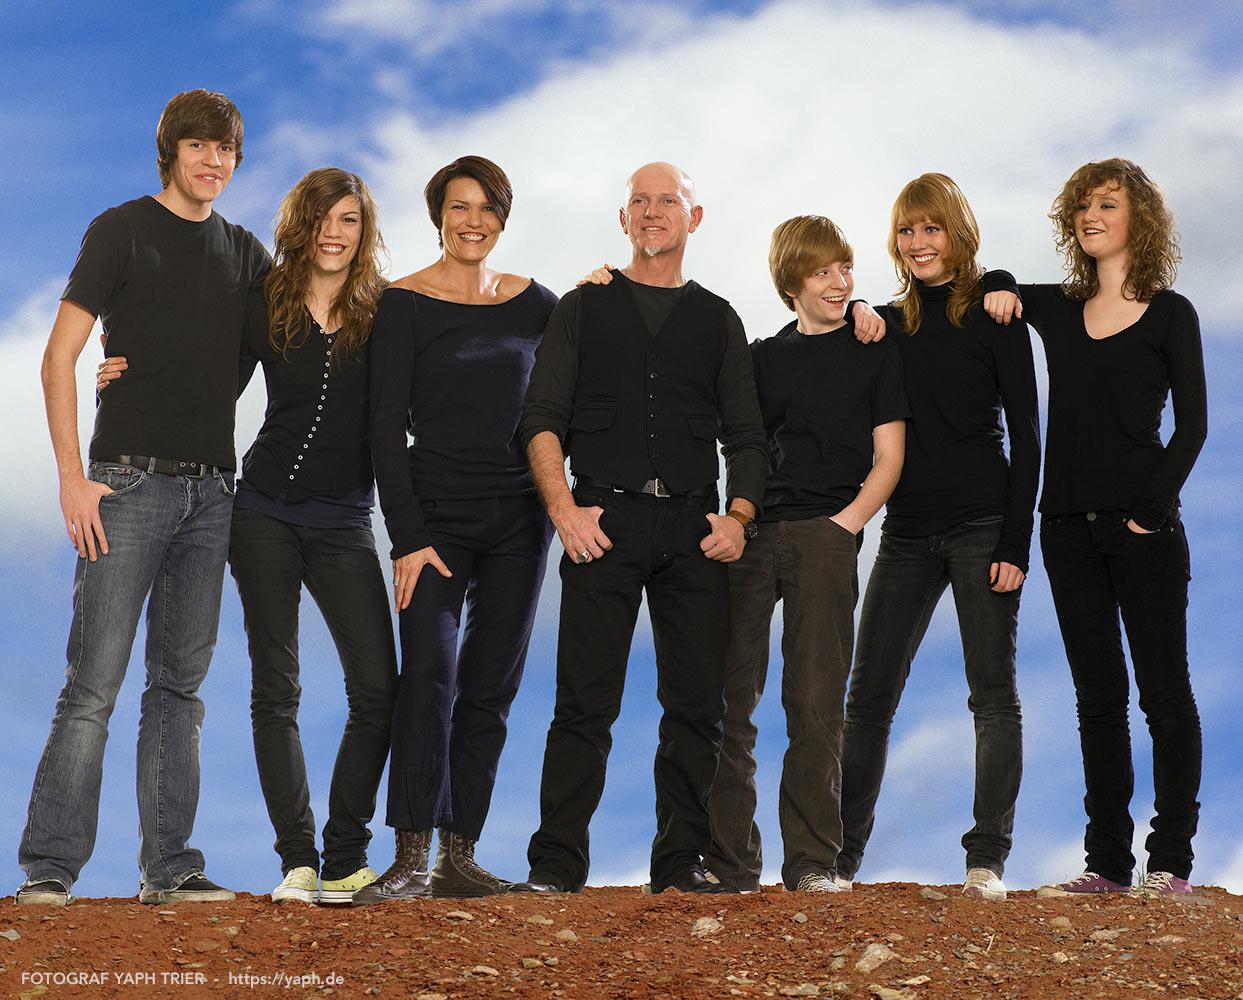 Familien Fotoshooting outdoor und Familienbillder bei Fotograf Trier - Yaph